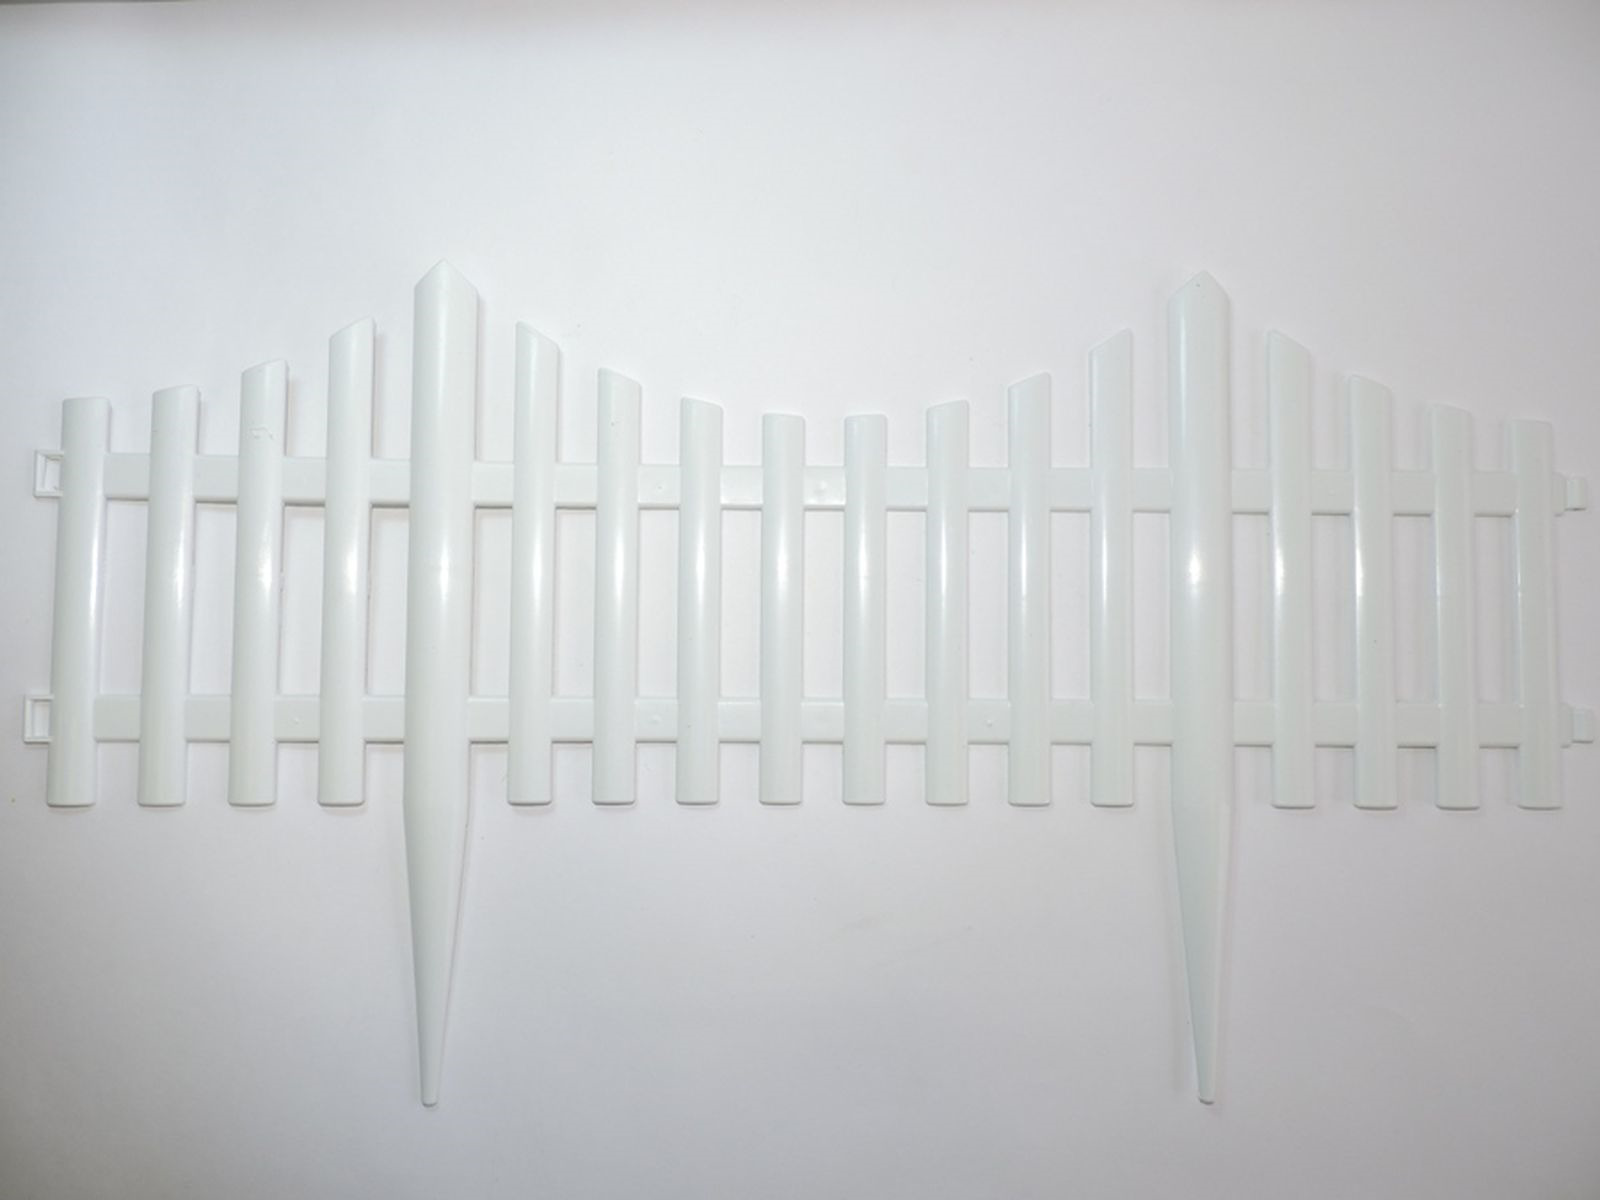 Забор садовый Ромашка, S306, белый, 60 х 33 см, 4 шт